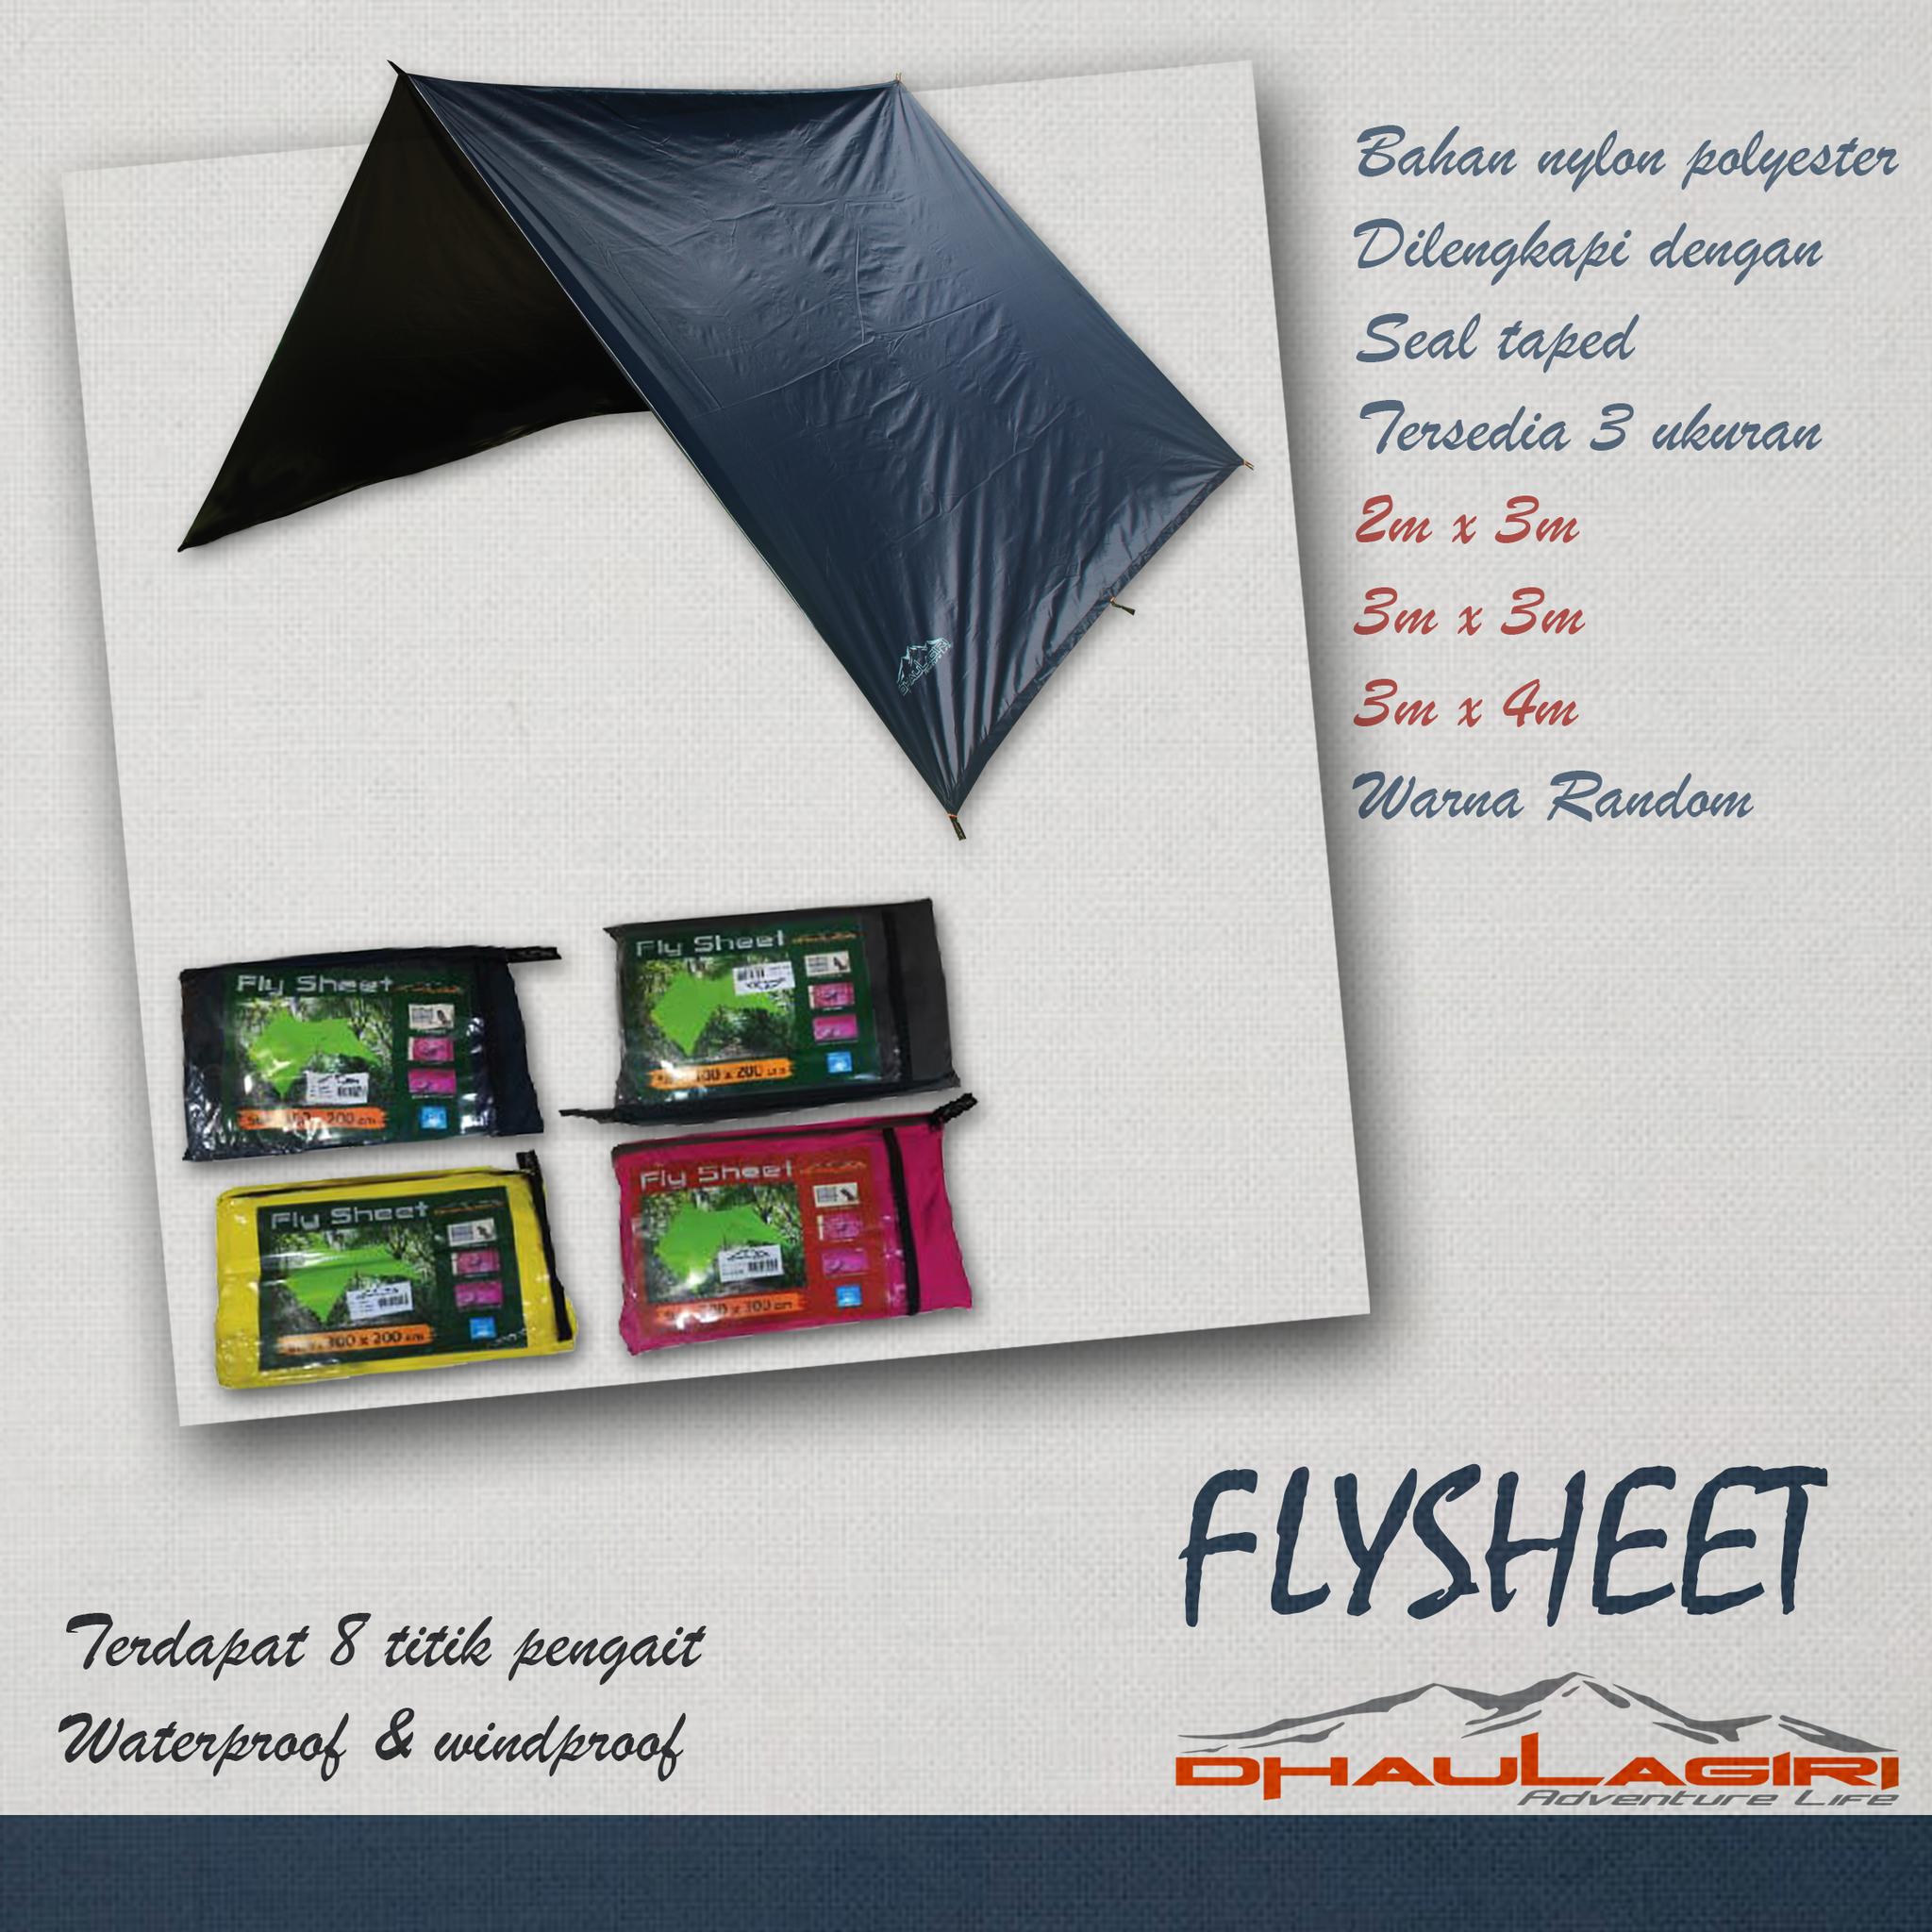 Jual Dh Flyseet 2x3 M Nirwana Outdoor Tokopedia Flysheet Tenda